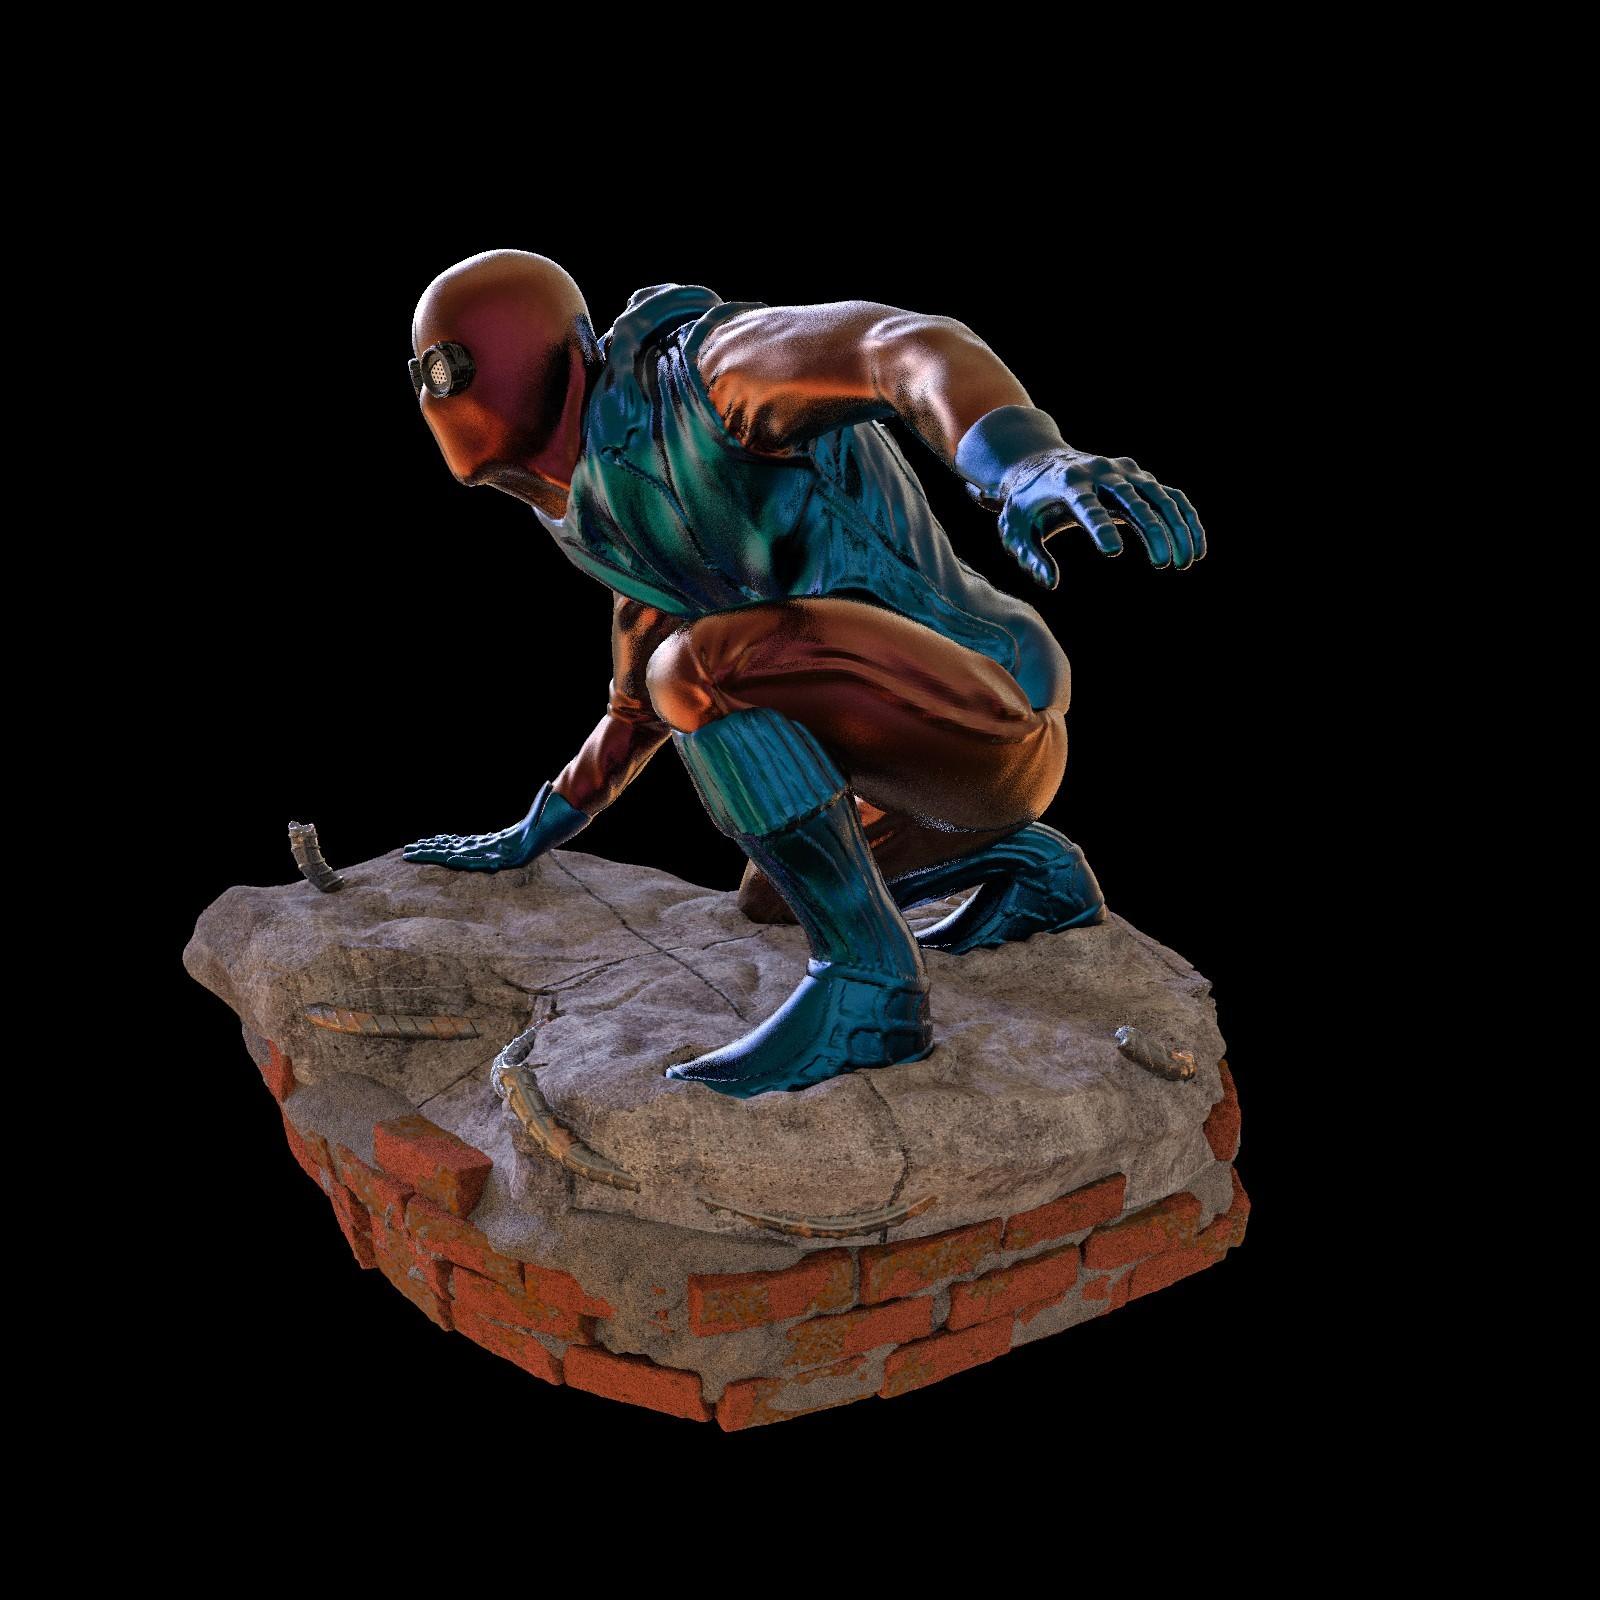 21.jpg Download STL file Spider-Man Homemade Suit • Design to 3D print, tolgaaxu